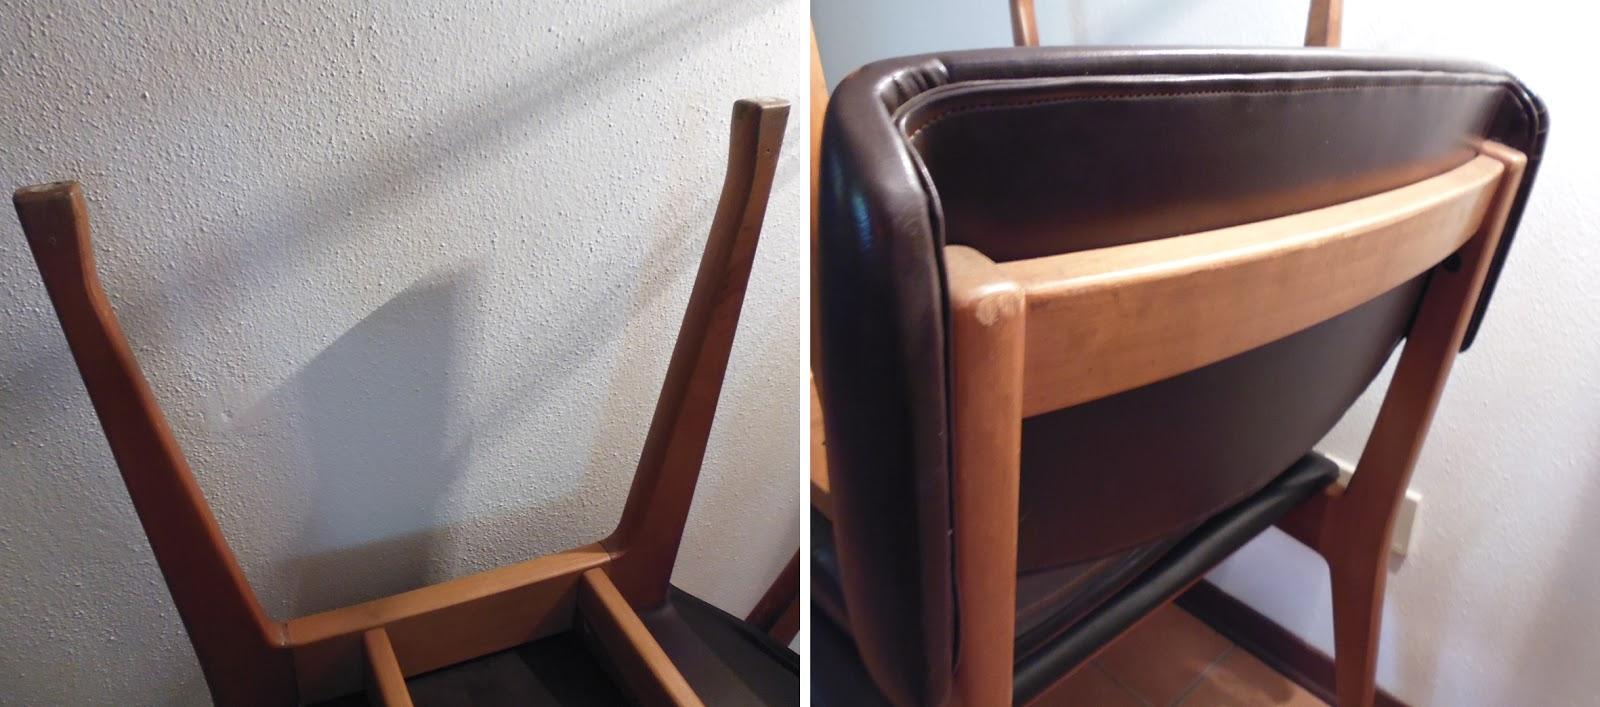 Rimodern set di 4 sedie firmate mim ico parisi roma for Sedie design roma